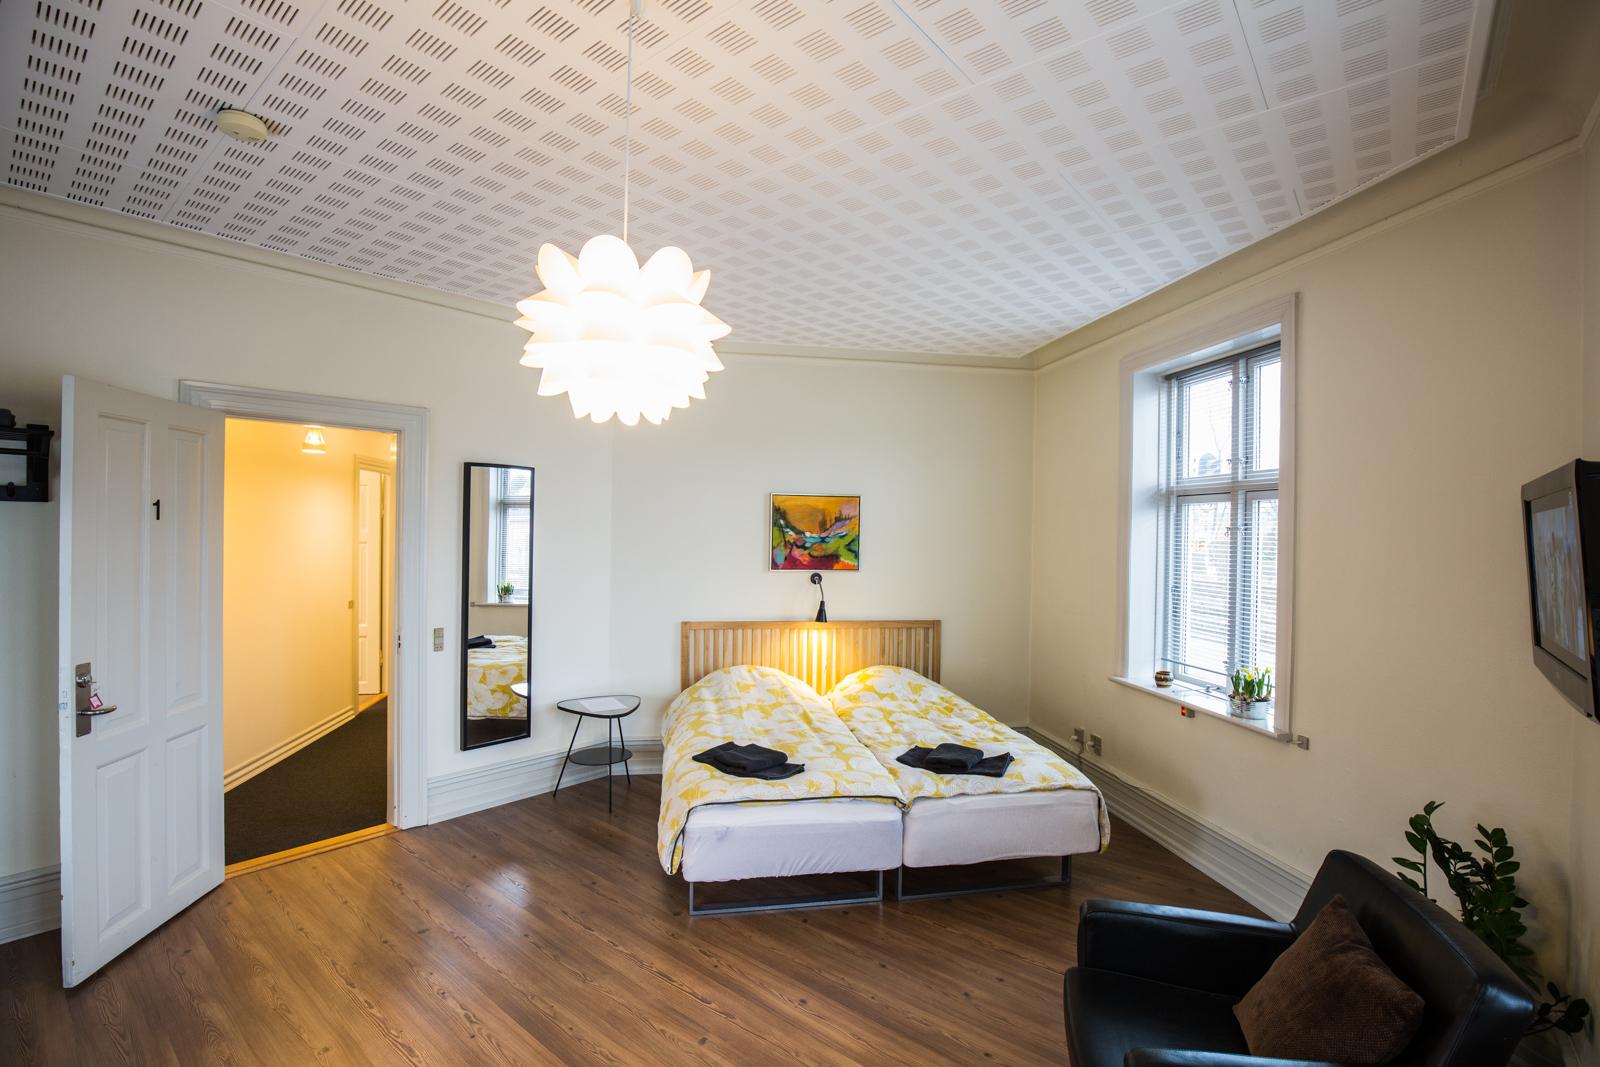 Bed and Breakfast Holstebro åbent rum